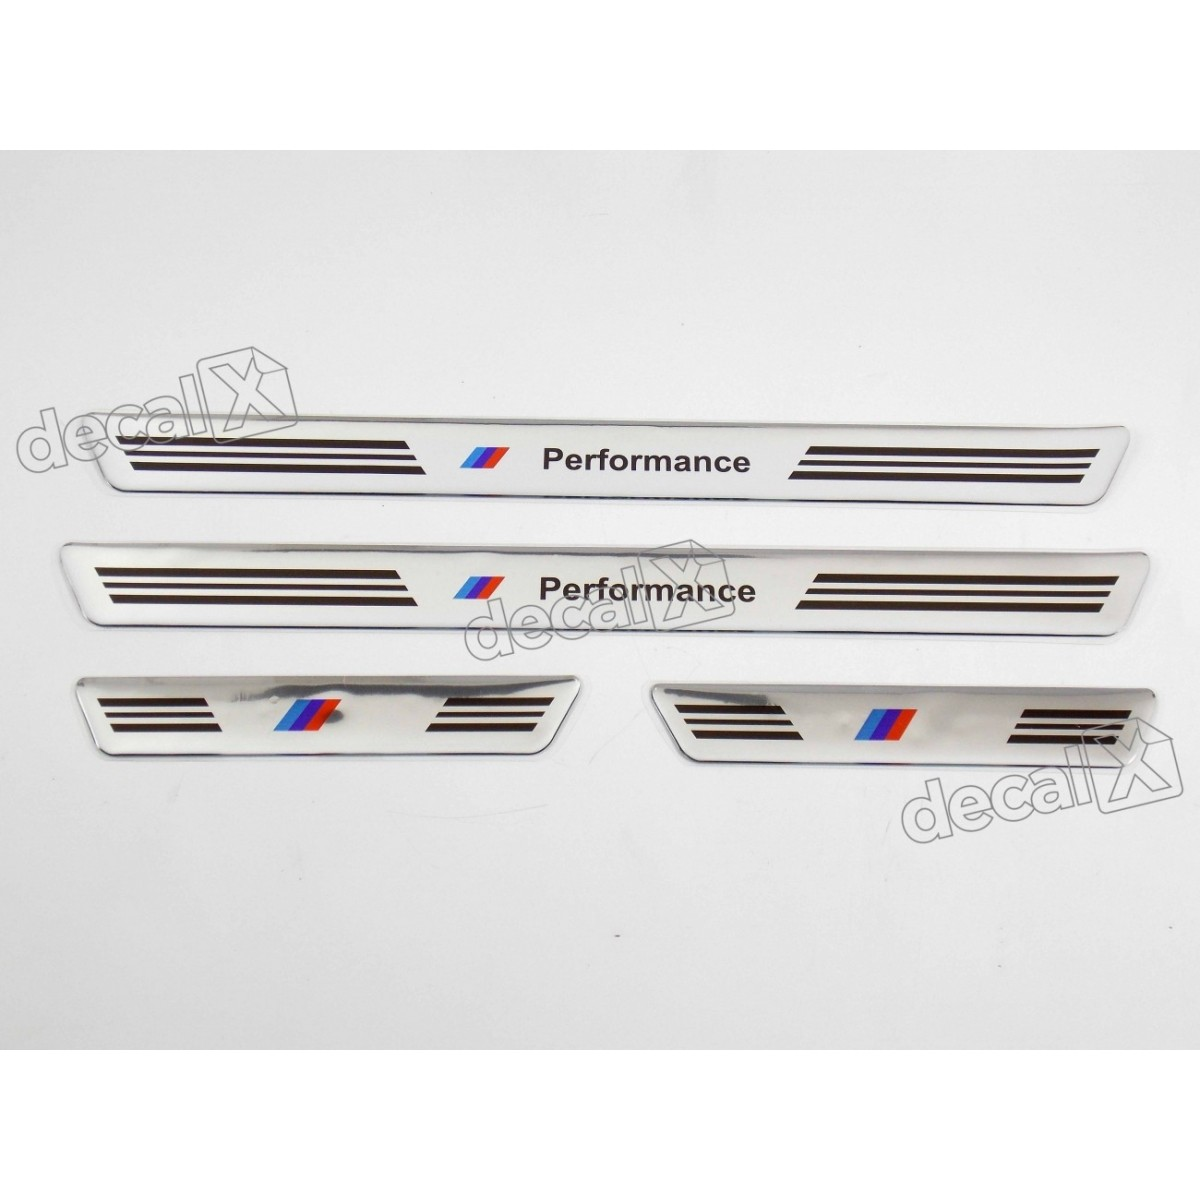 Soleira Resinada Bmw Performance - Decalx